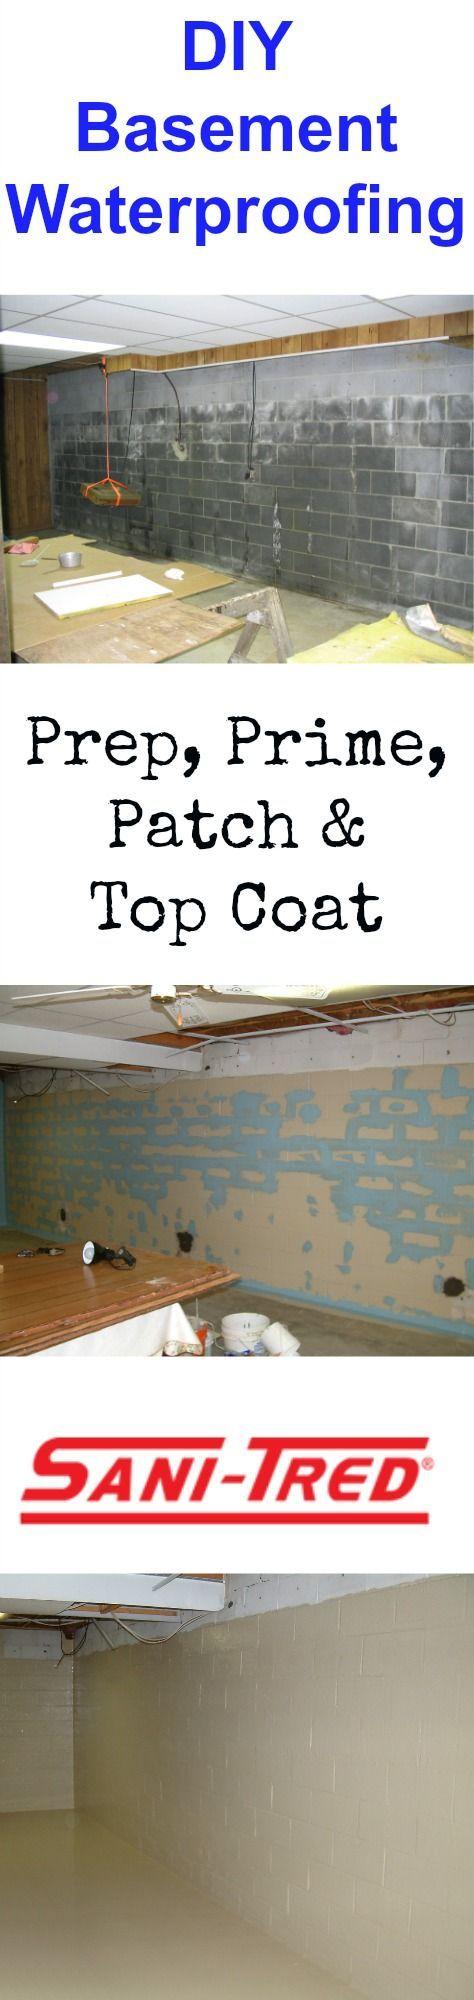 about basement waterproofing on pinterest wet basement basements